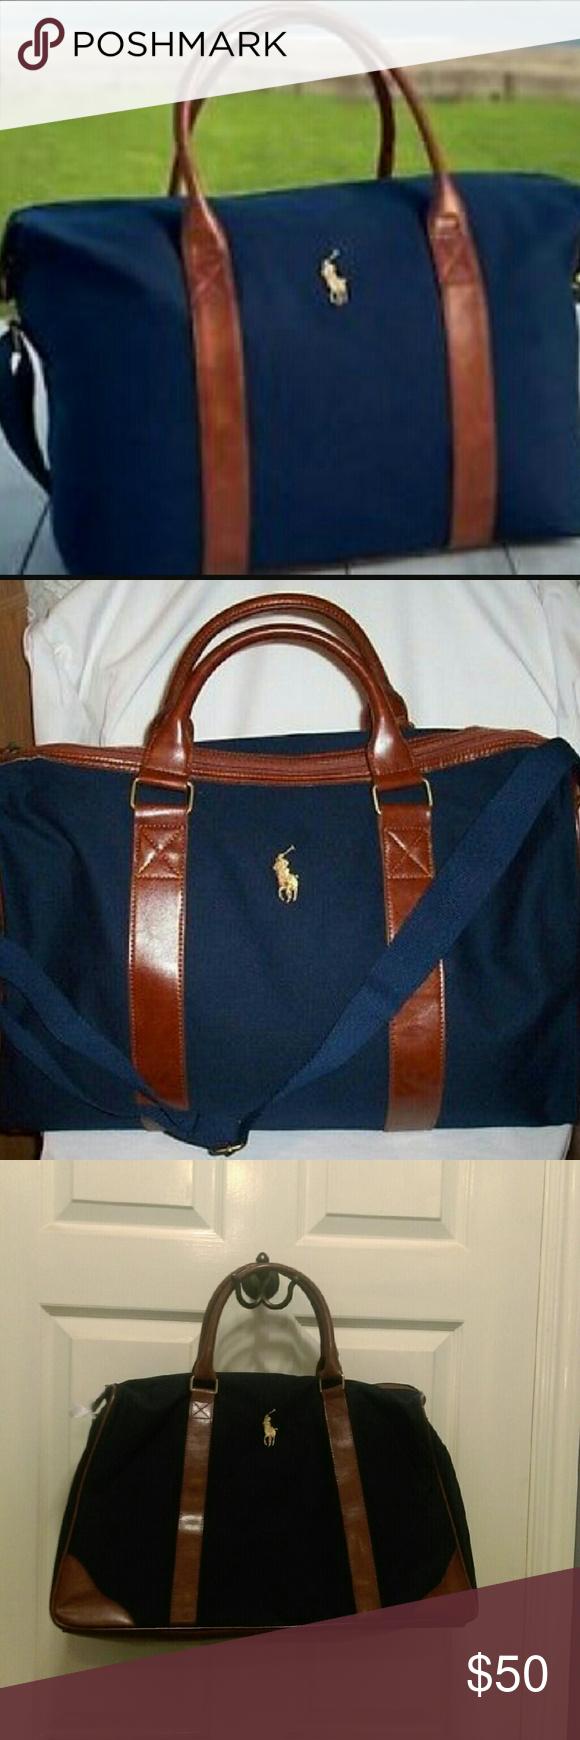 Used Travel Overnight Ralph New Been Gym Polo Bag Never Pony Lauren lFJc1TK